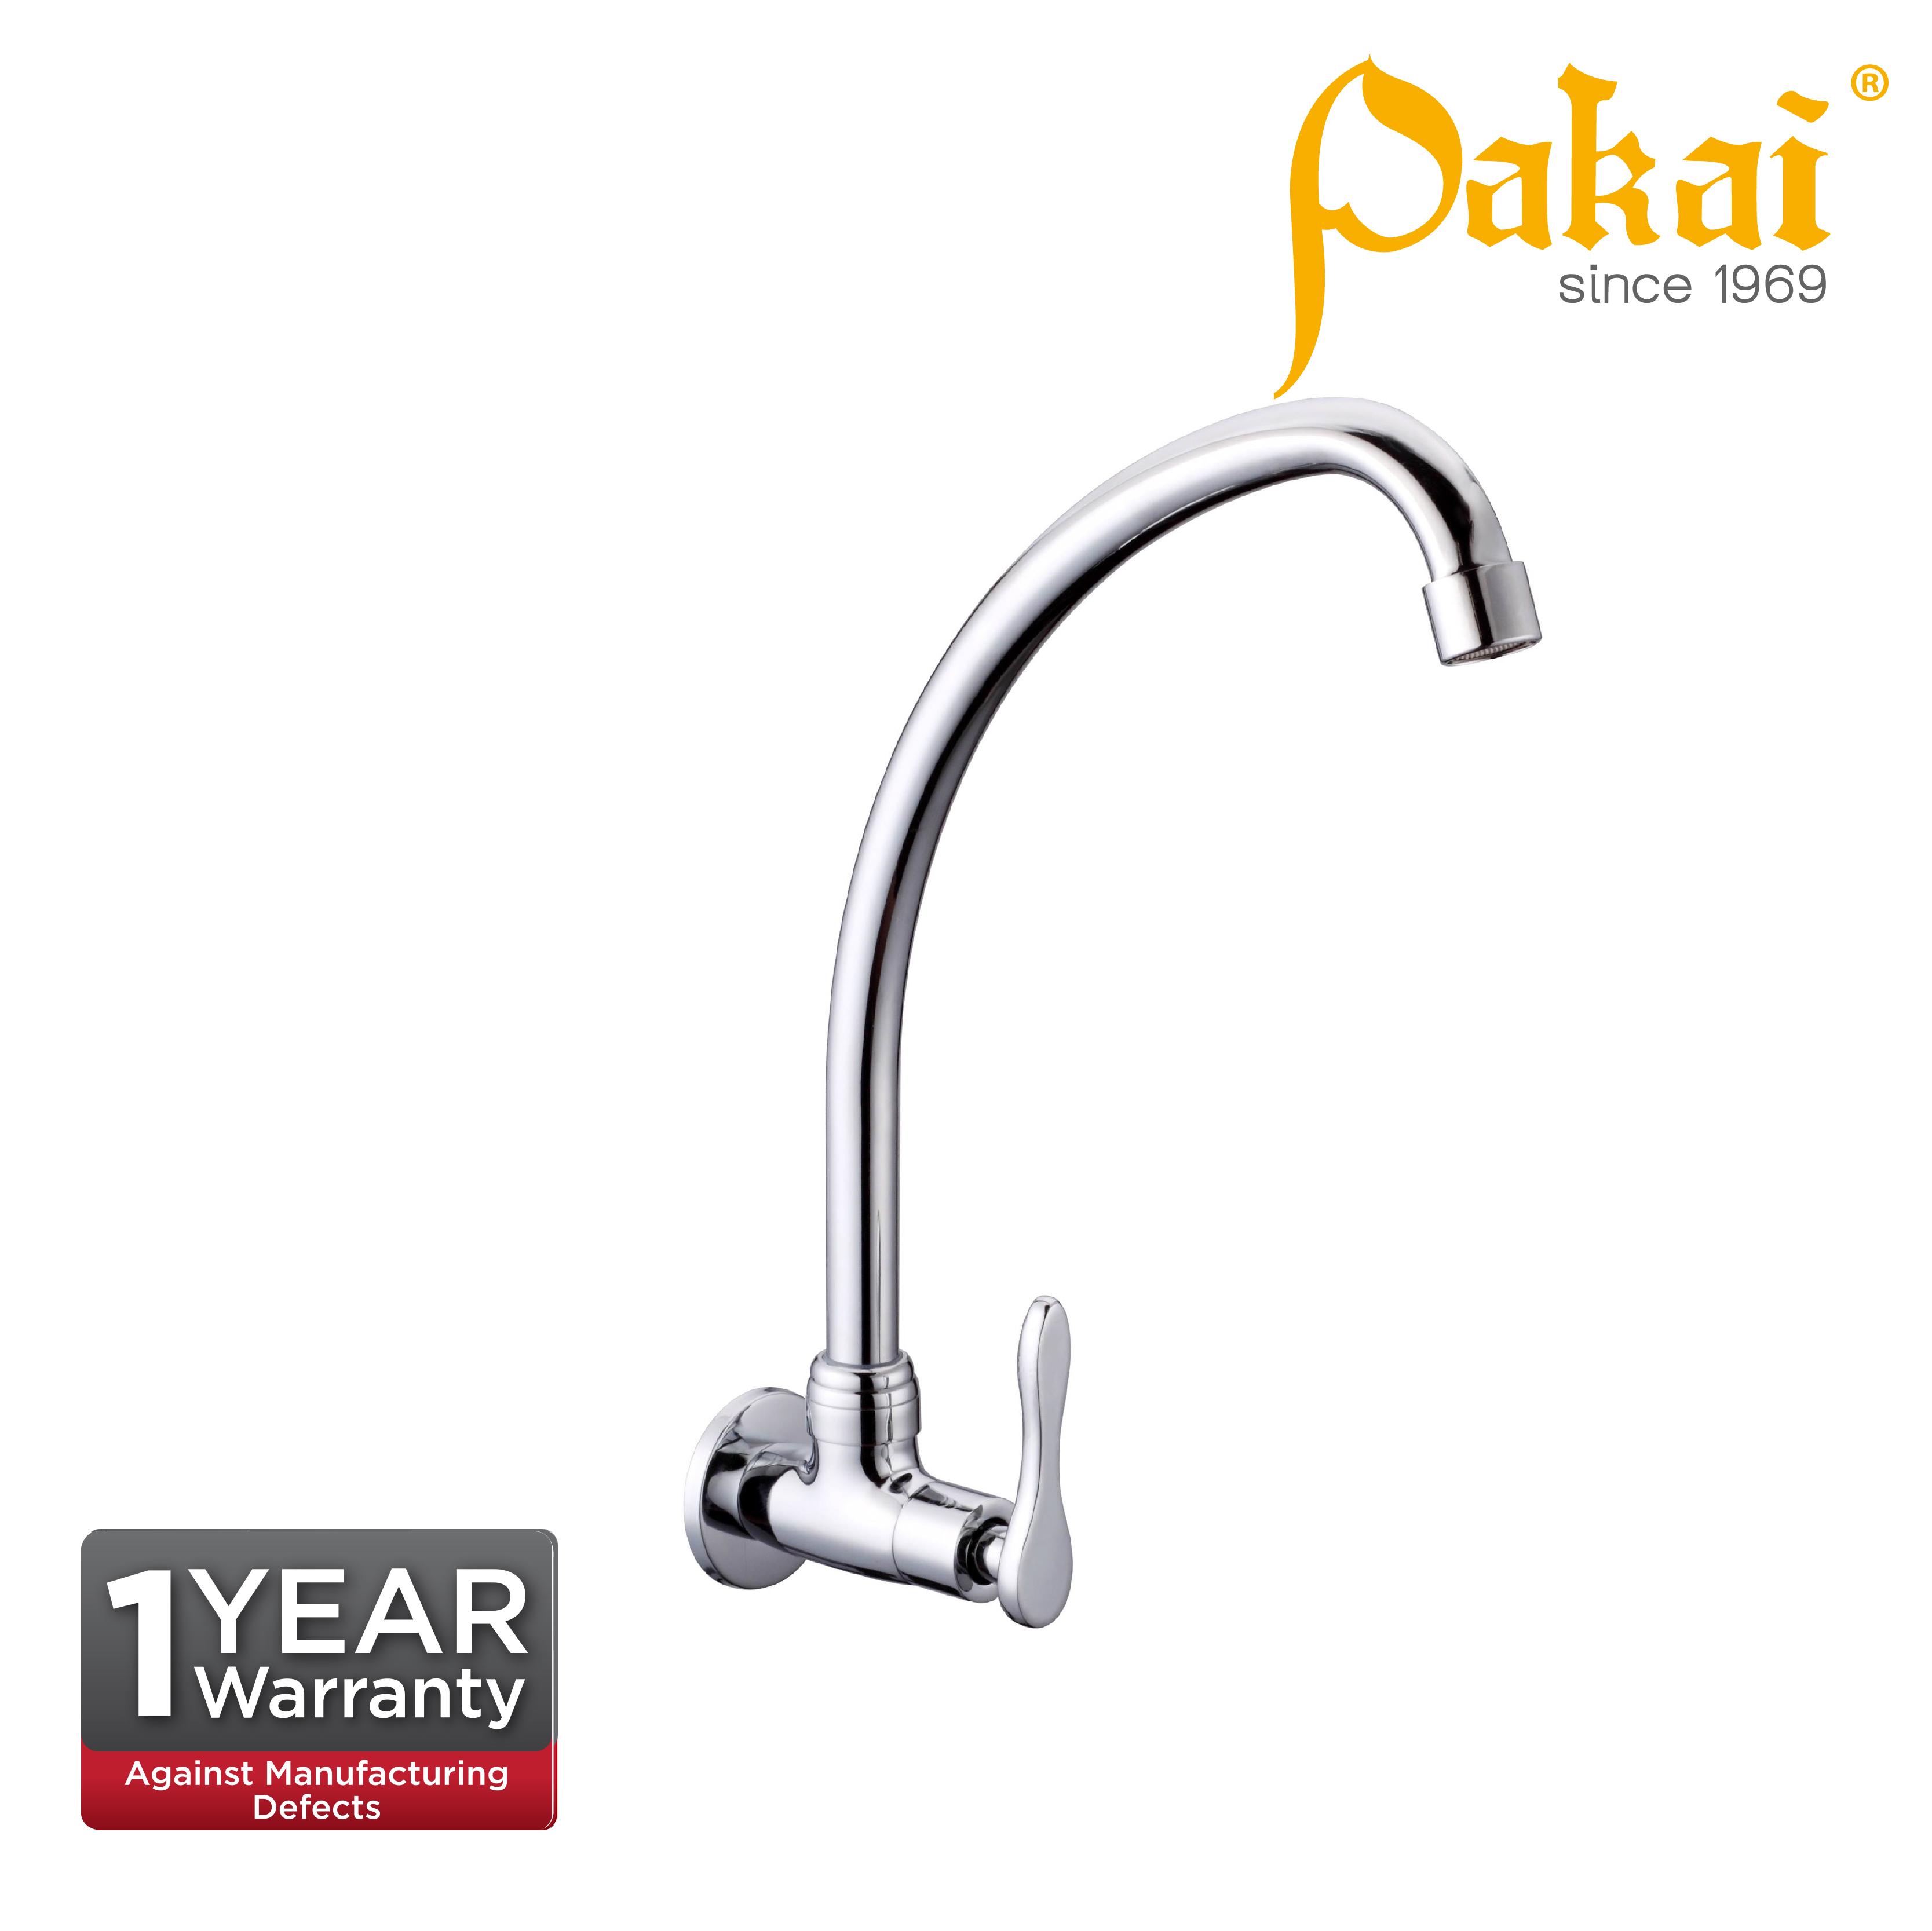 Pakai Wall Sink Tap Ear Spout Curve Series CV51000ES